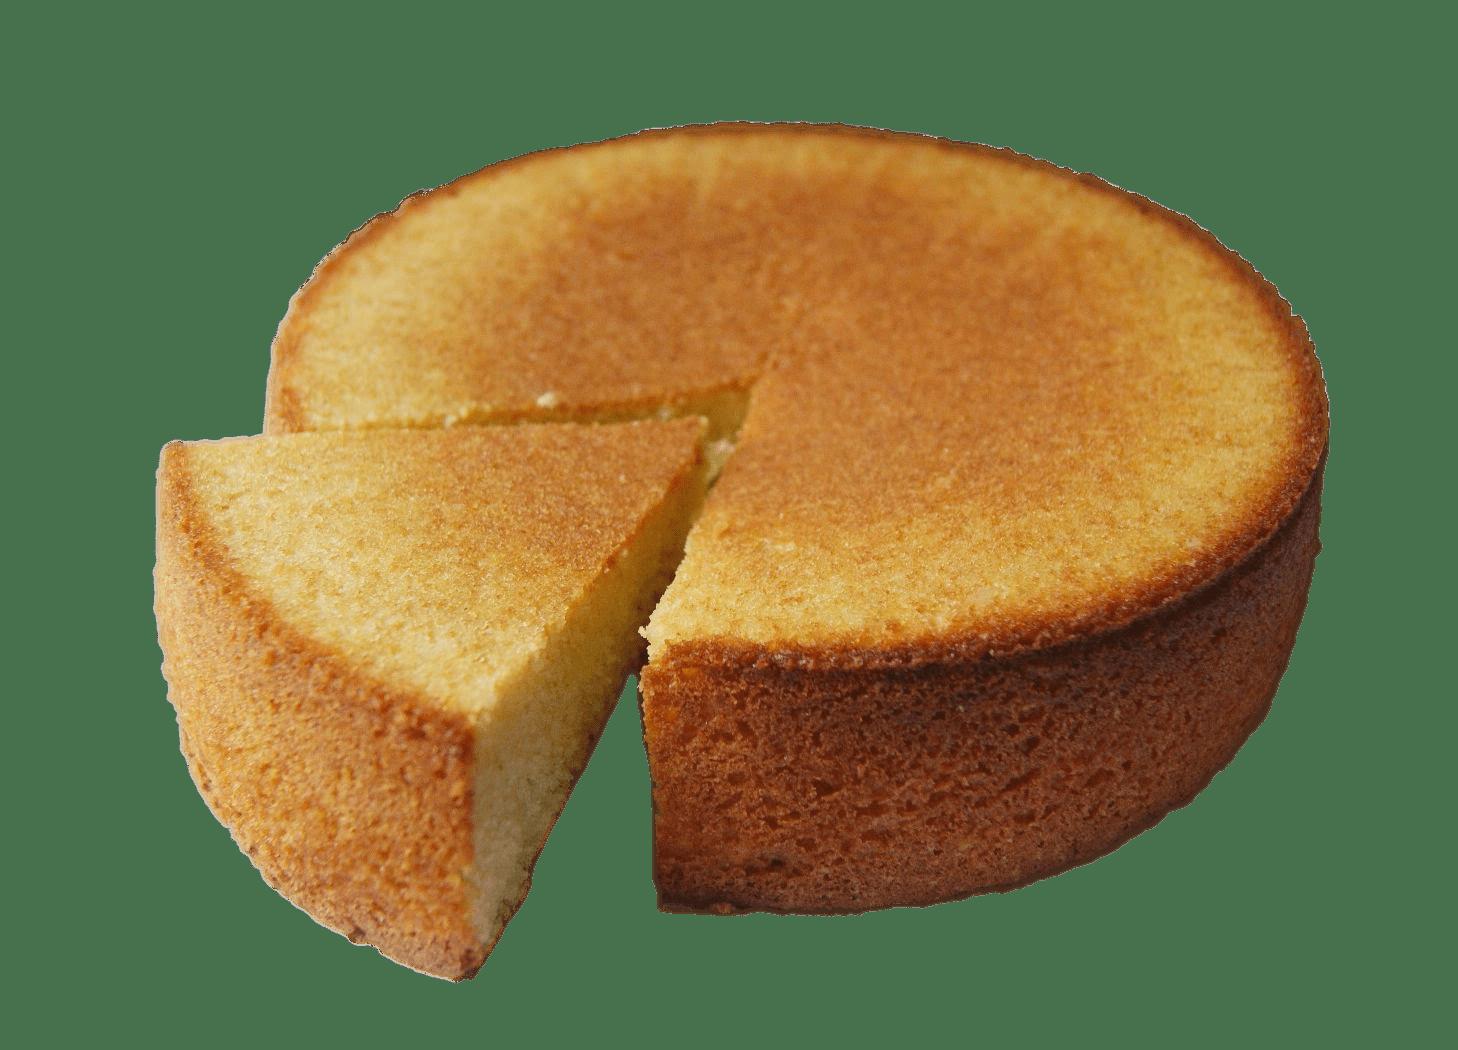 Bizcocho transparent png stickpng. Desserts clipart bread pudding